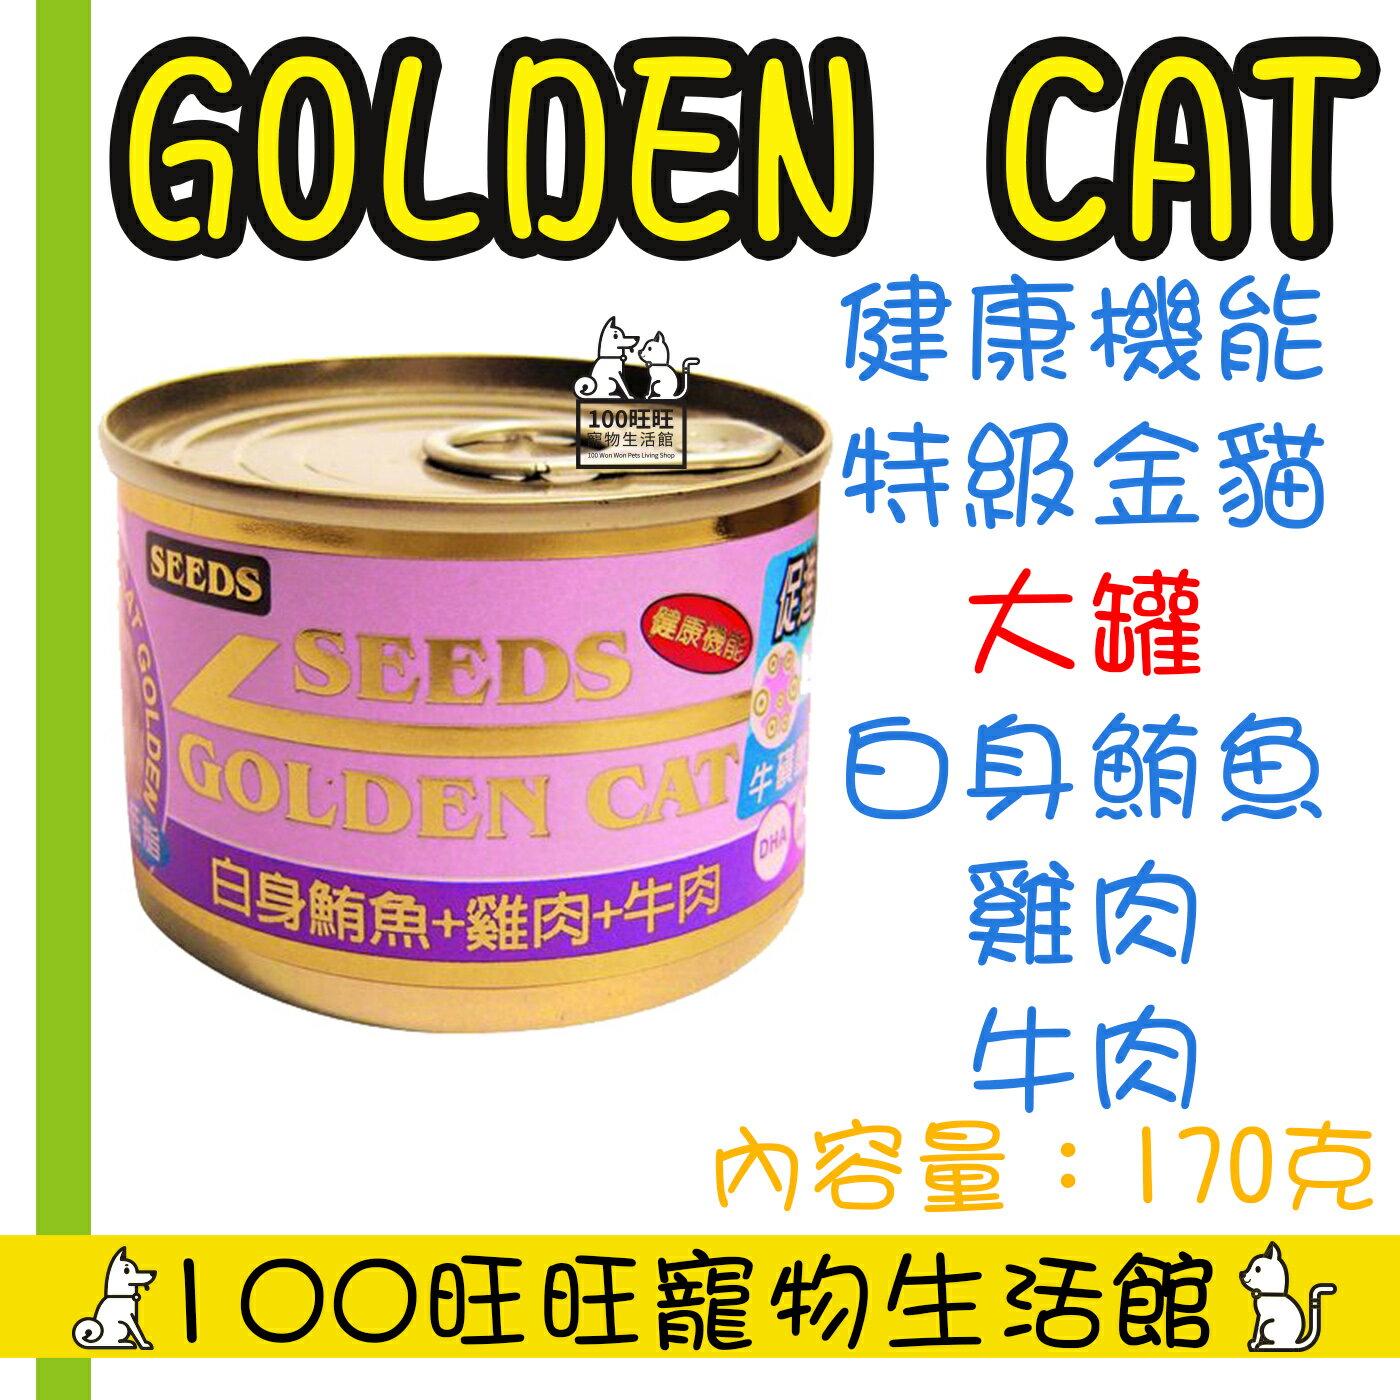 SEED 惜時 聖萊西 特級金貓大罐 金罐 大金 170g 單罐